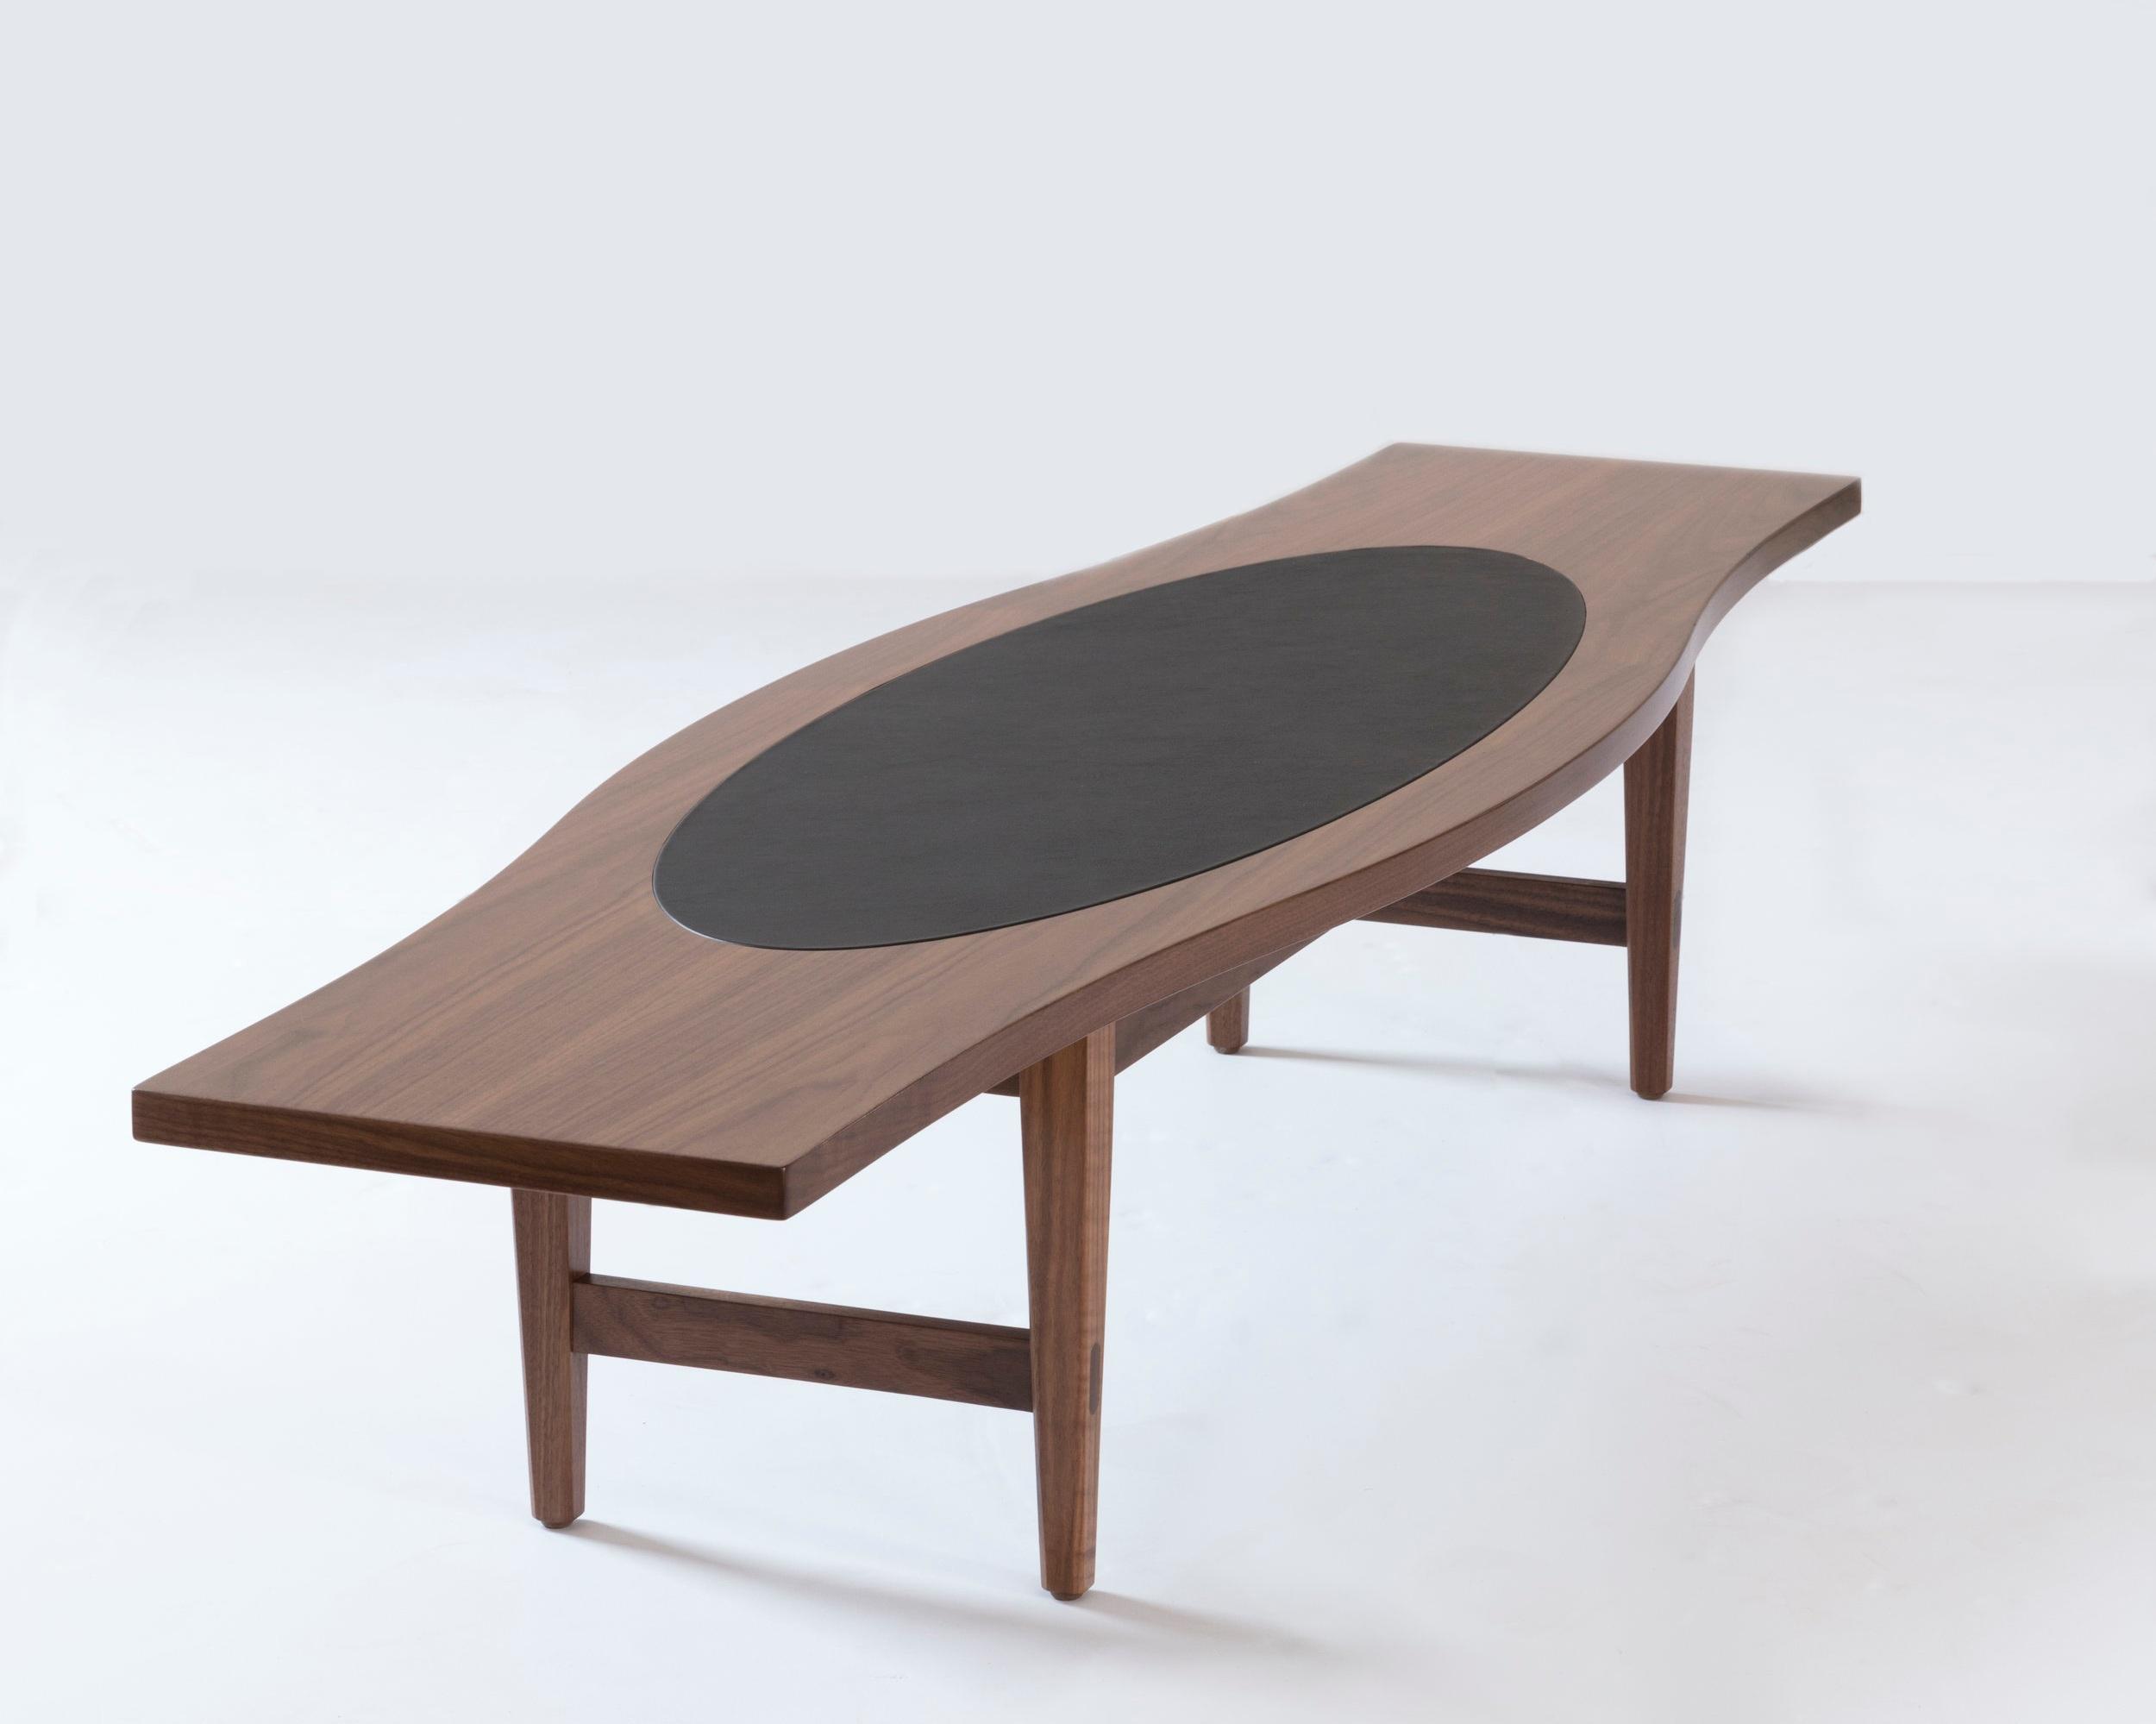 Oval+Coffee+Table_side.jpg